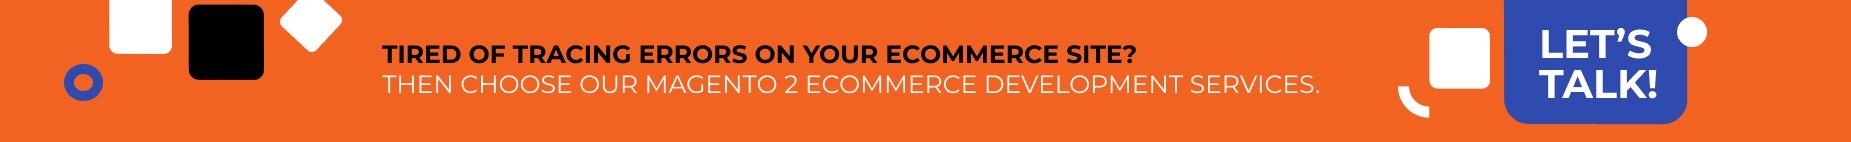 WebMeridian offers Magento 2 eCommerce website development services